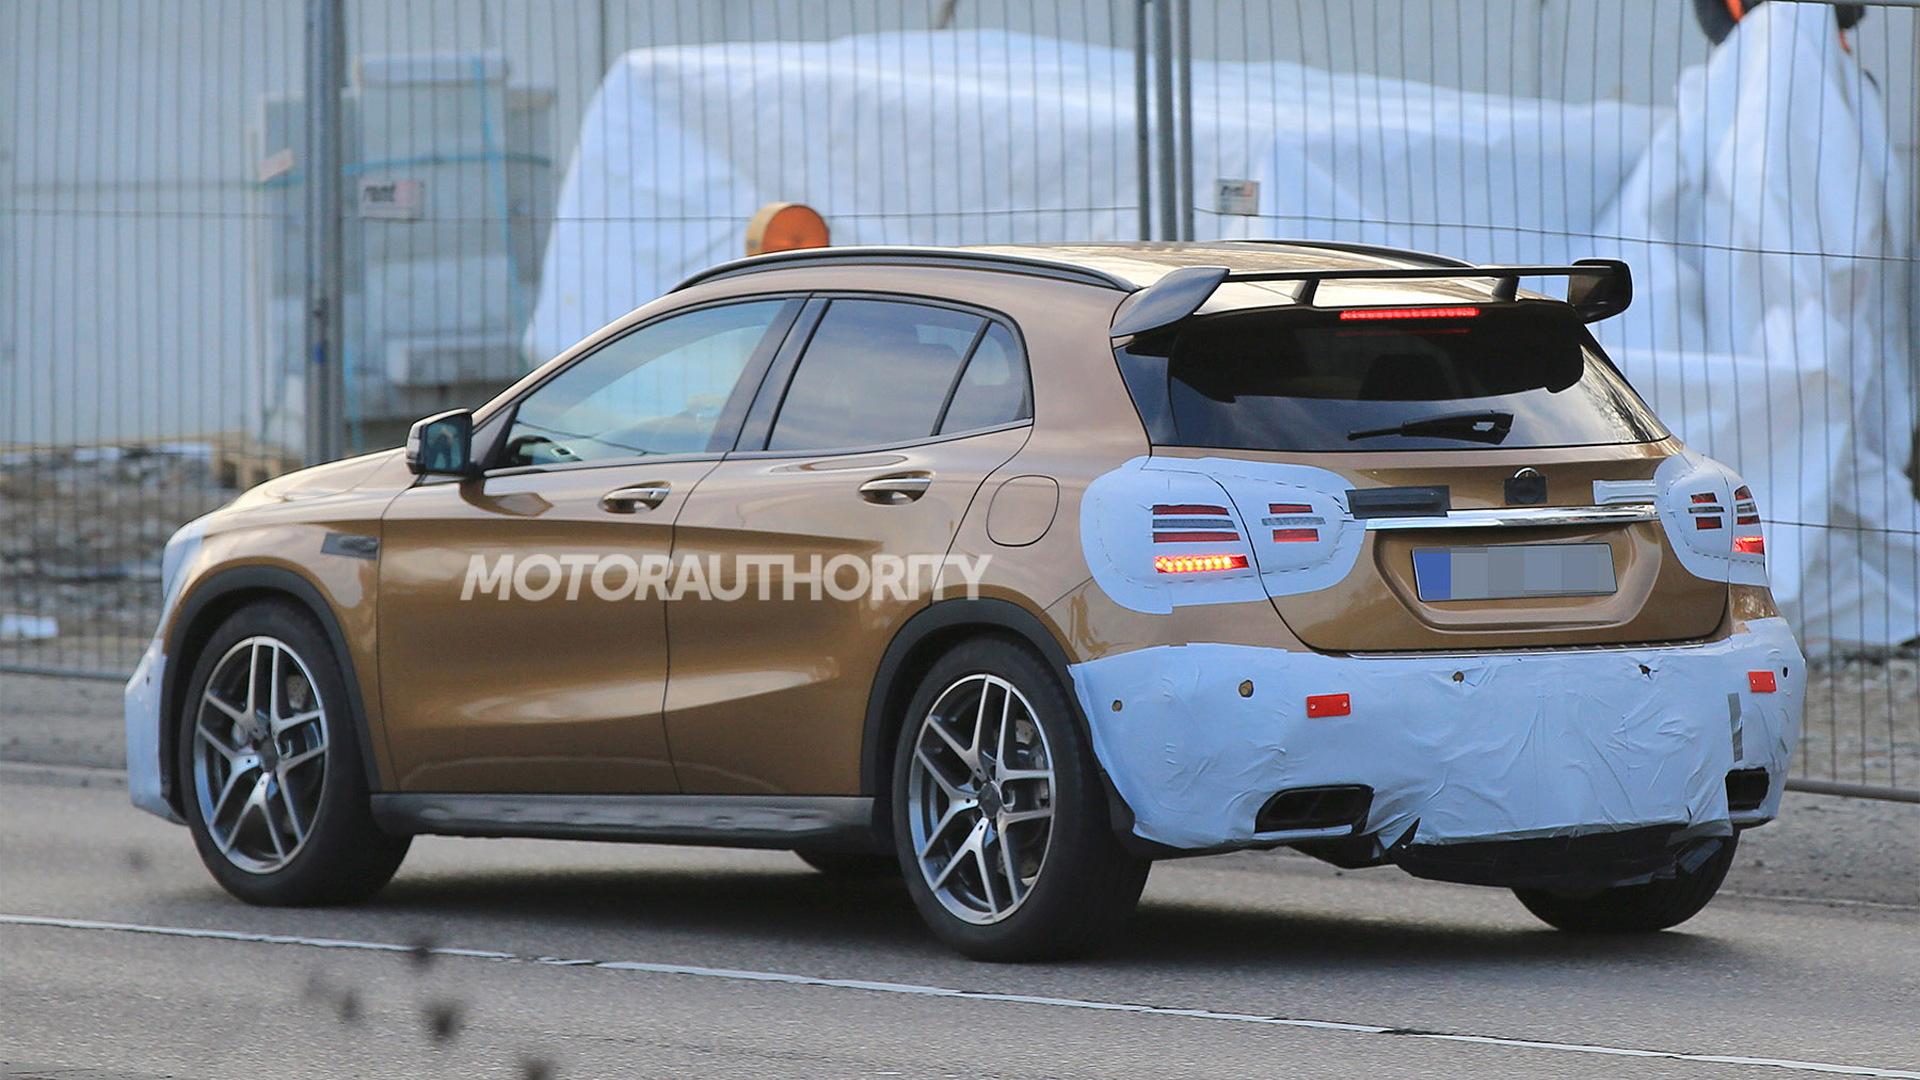 2018 Mercedes-AMG GLA45 spy shots - S. Baldauf/SB-Medien